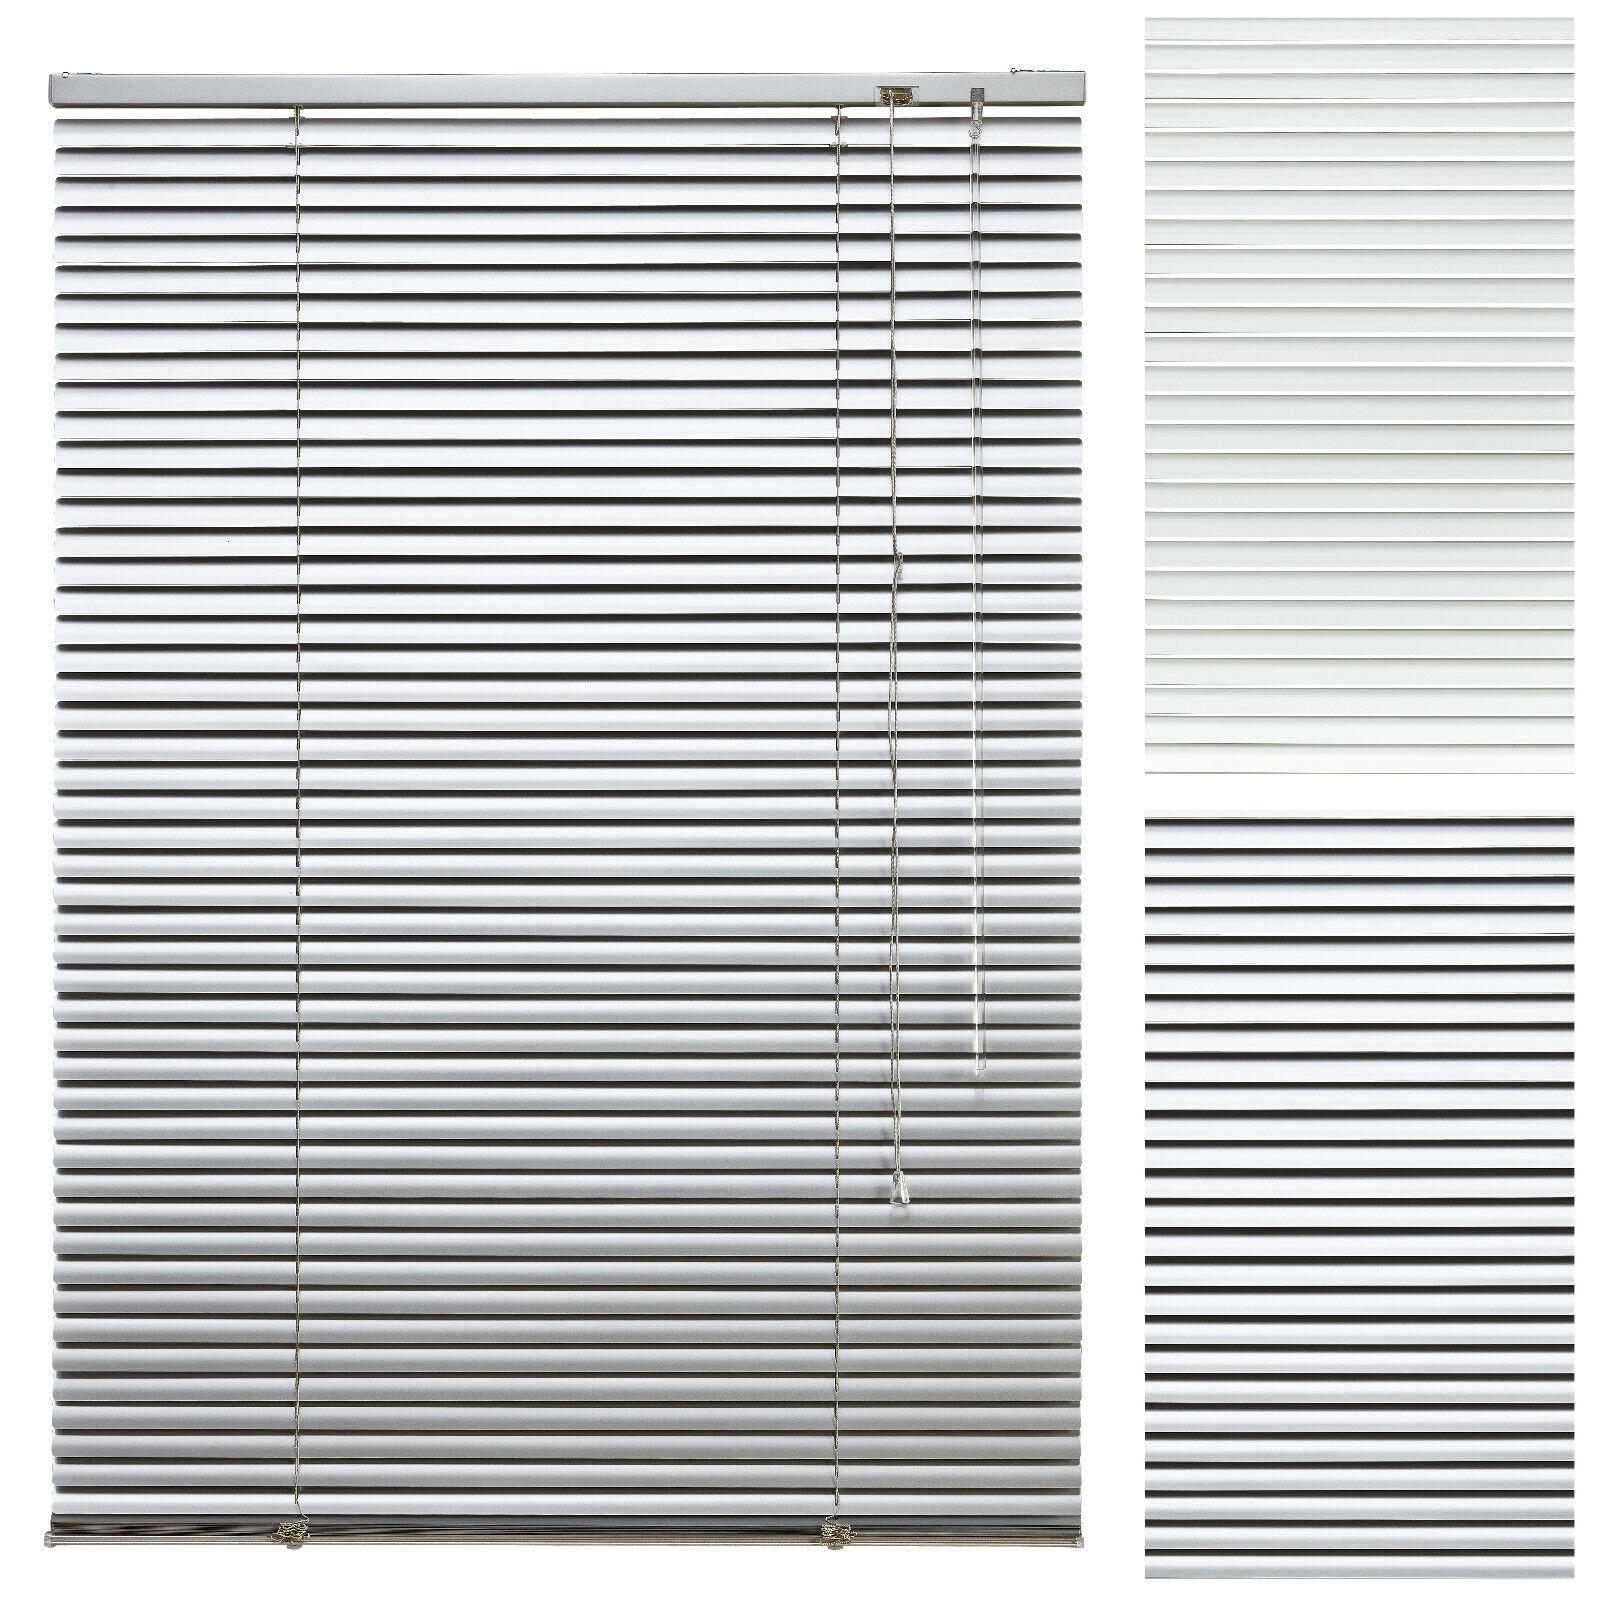 Alu Jalousie Aluminium Jalousette Tür Fenster Rollo Vorhang Lamellen Weiß Silber